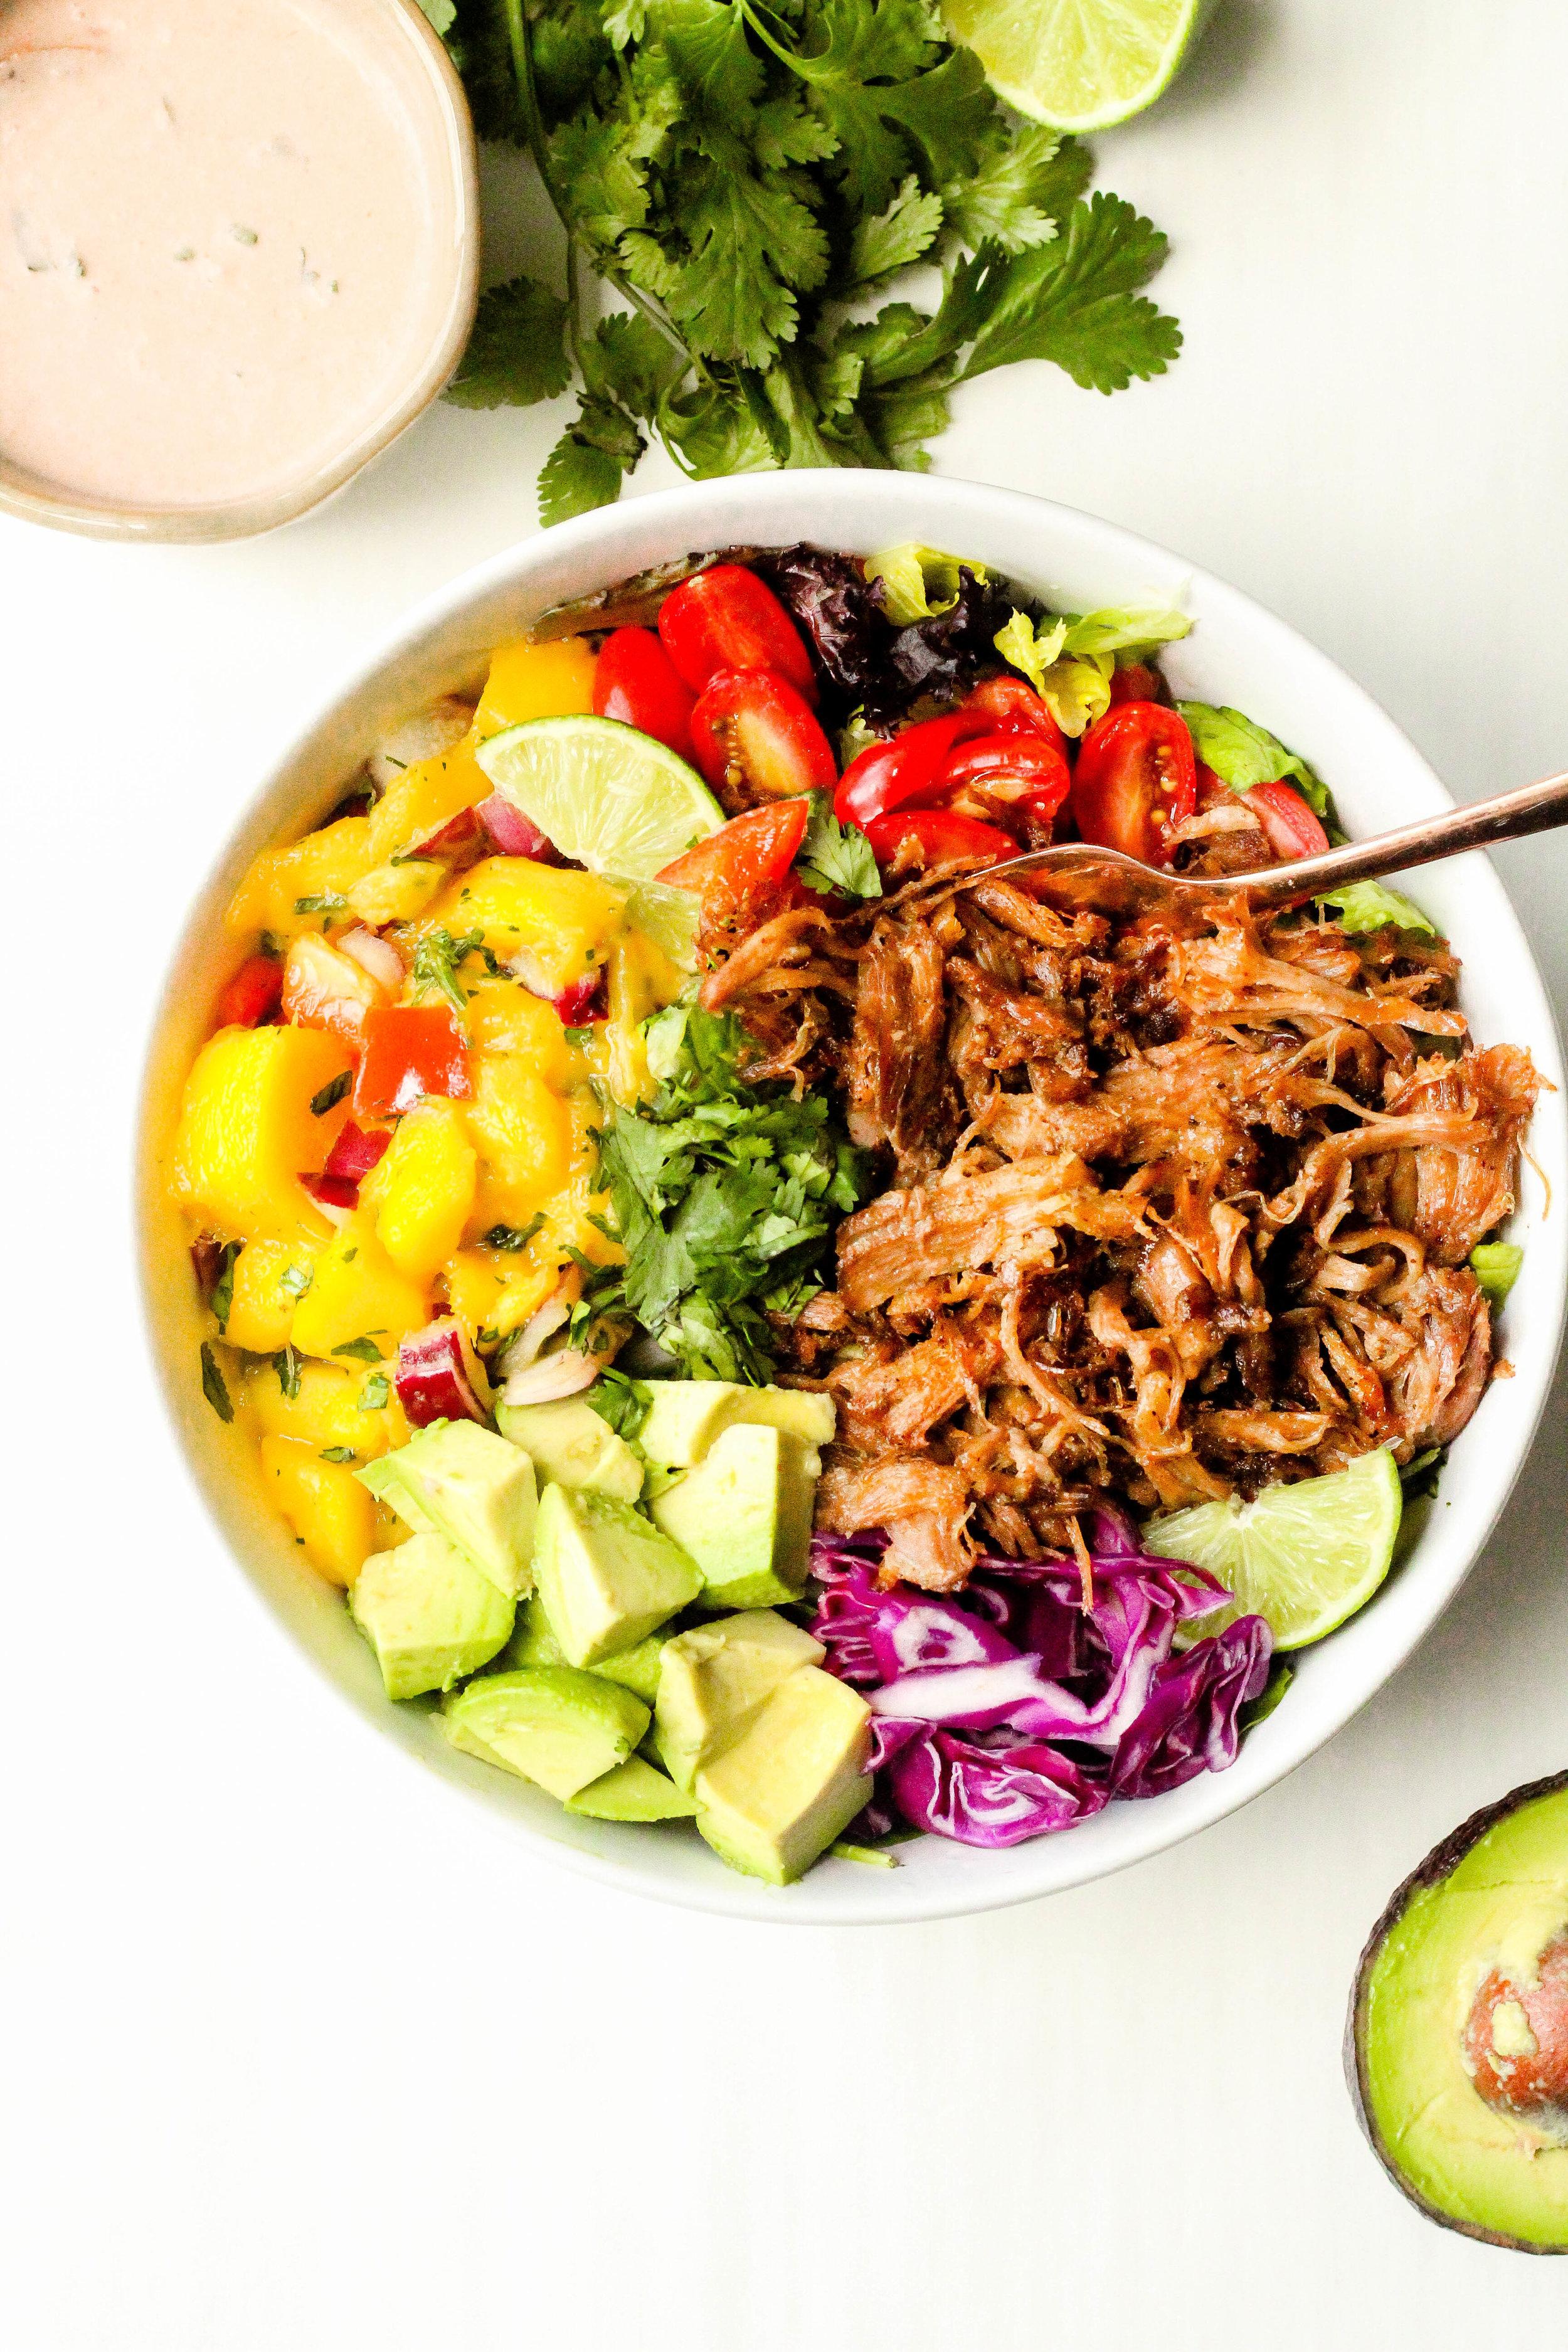 Slow Cooker Carnitas Taco Salad Bowls with Creamy Salsa Dressing